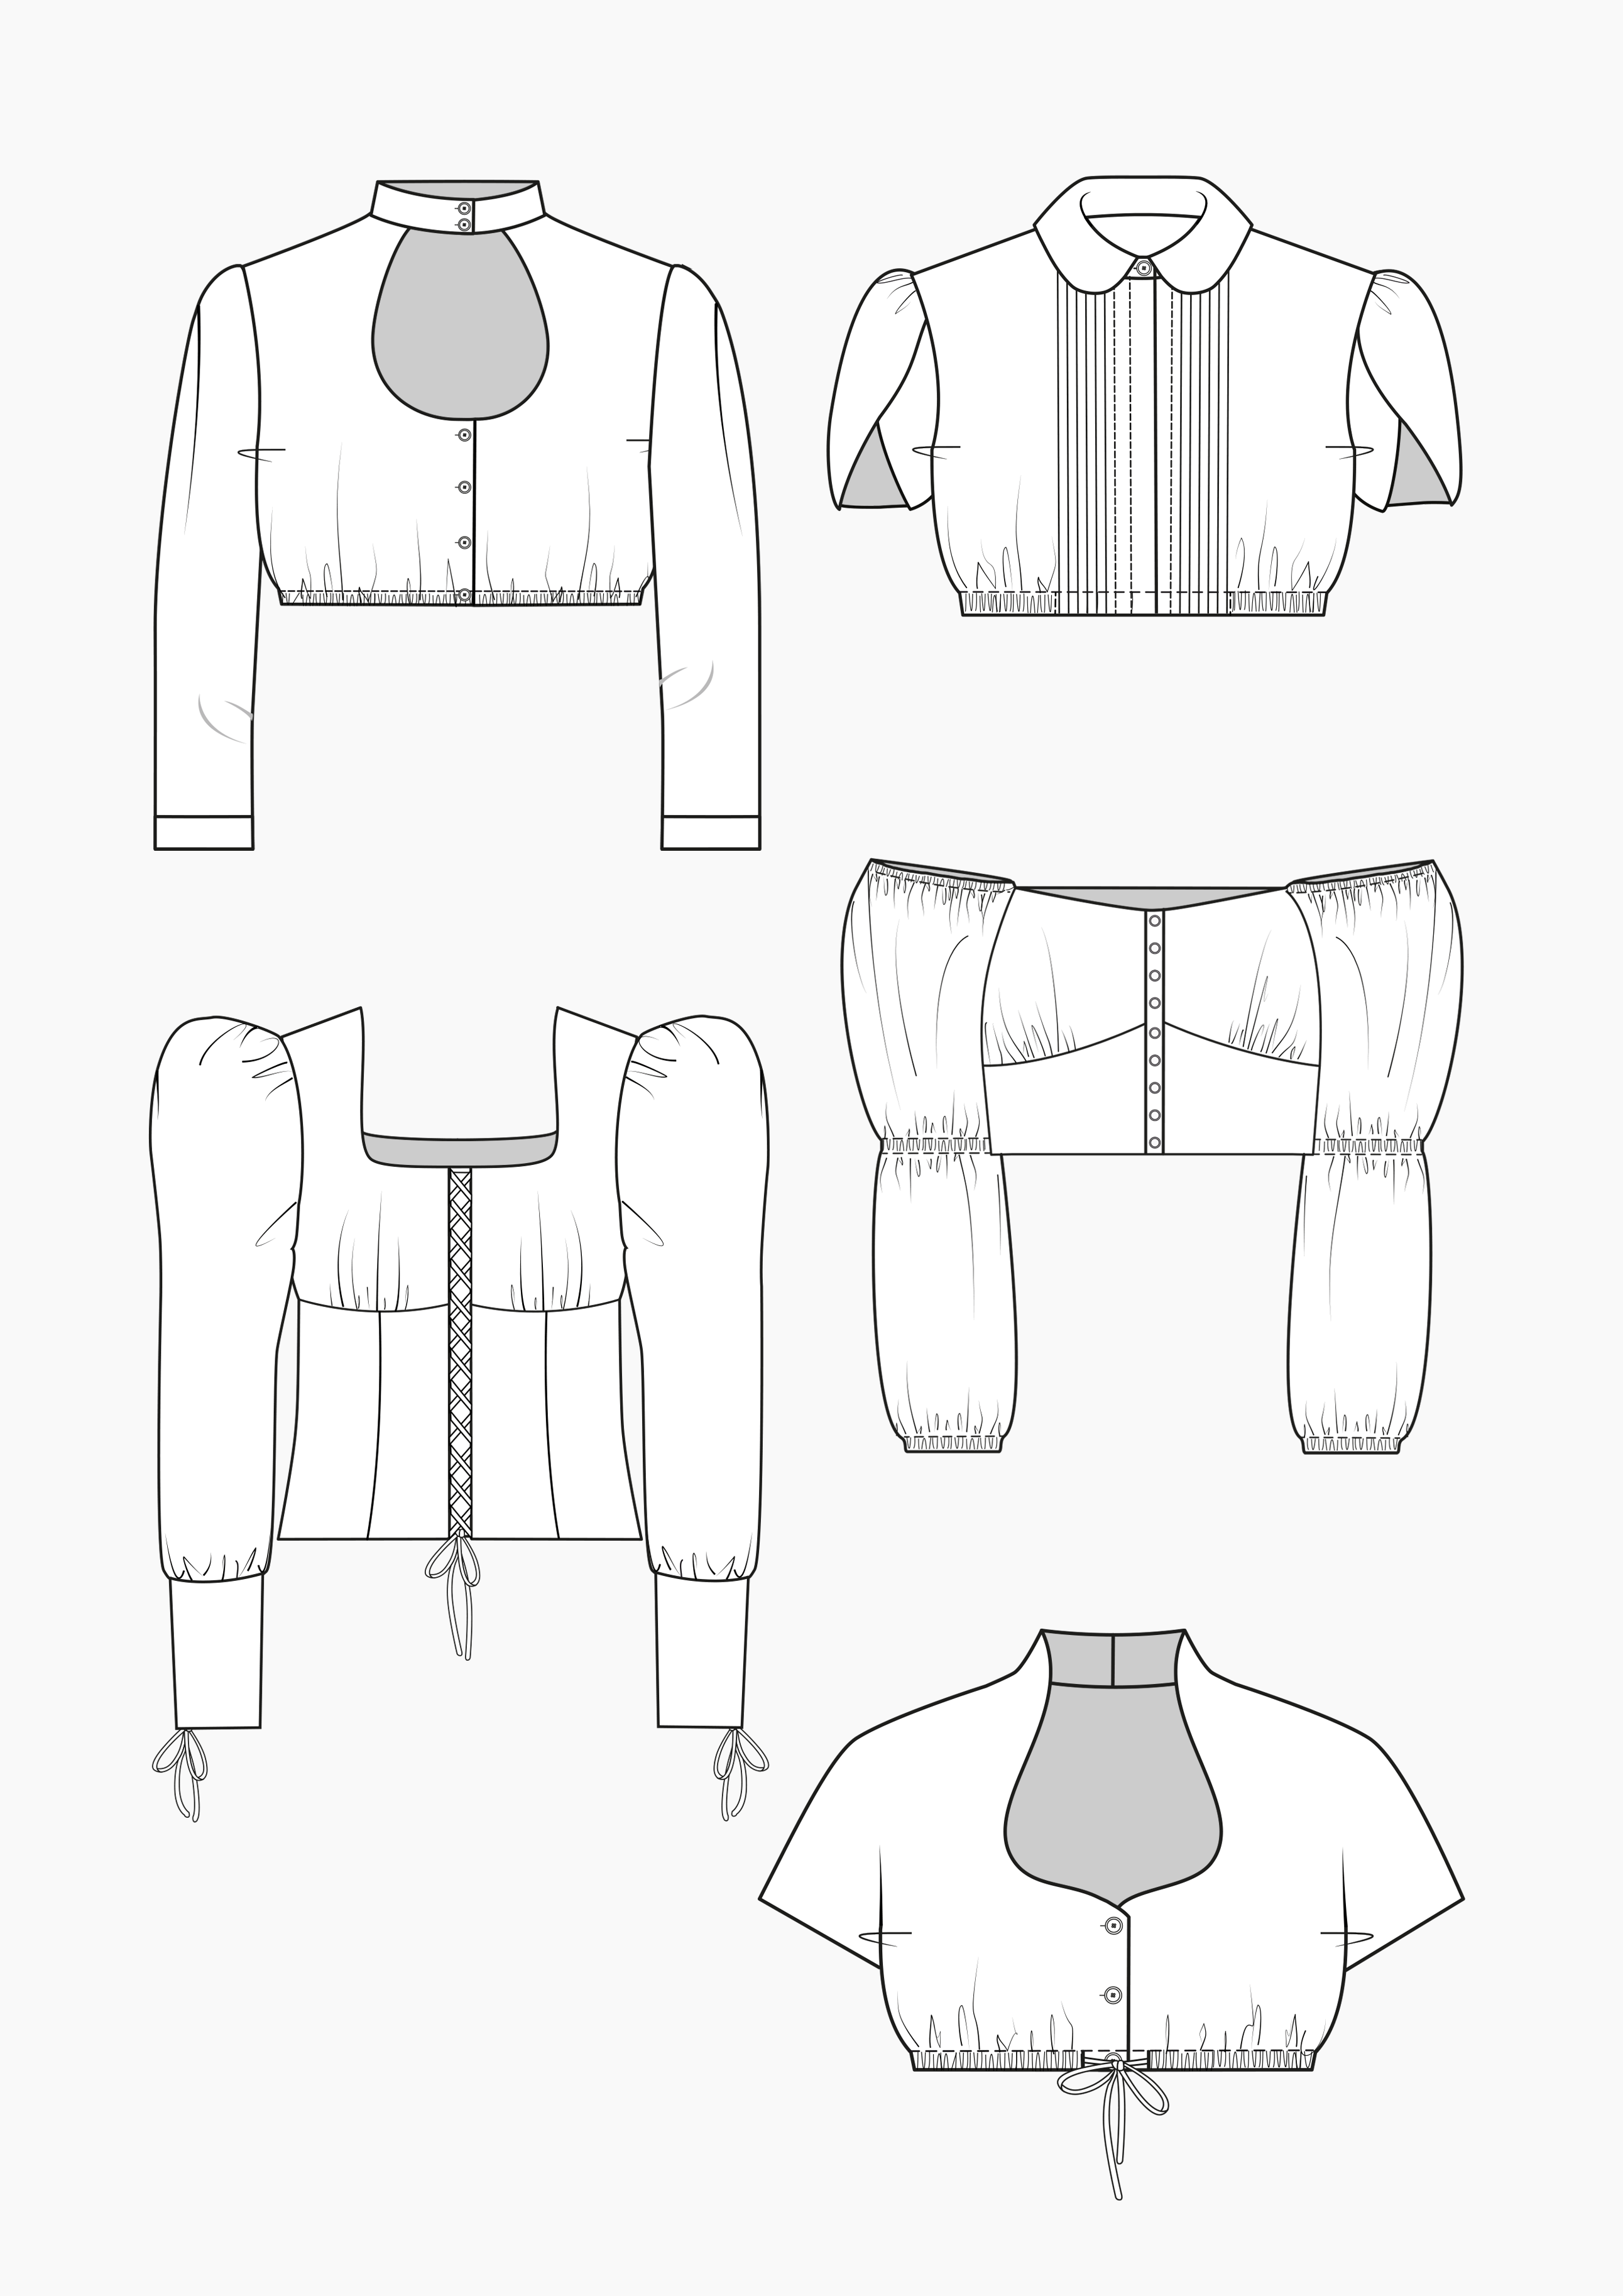 Produkt: Schnitt-Technik Dirndl-Blusen